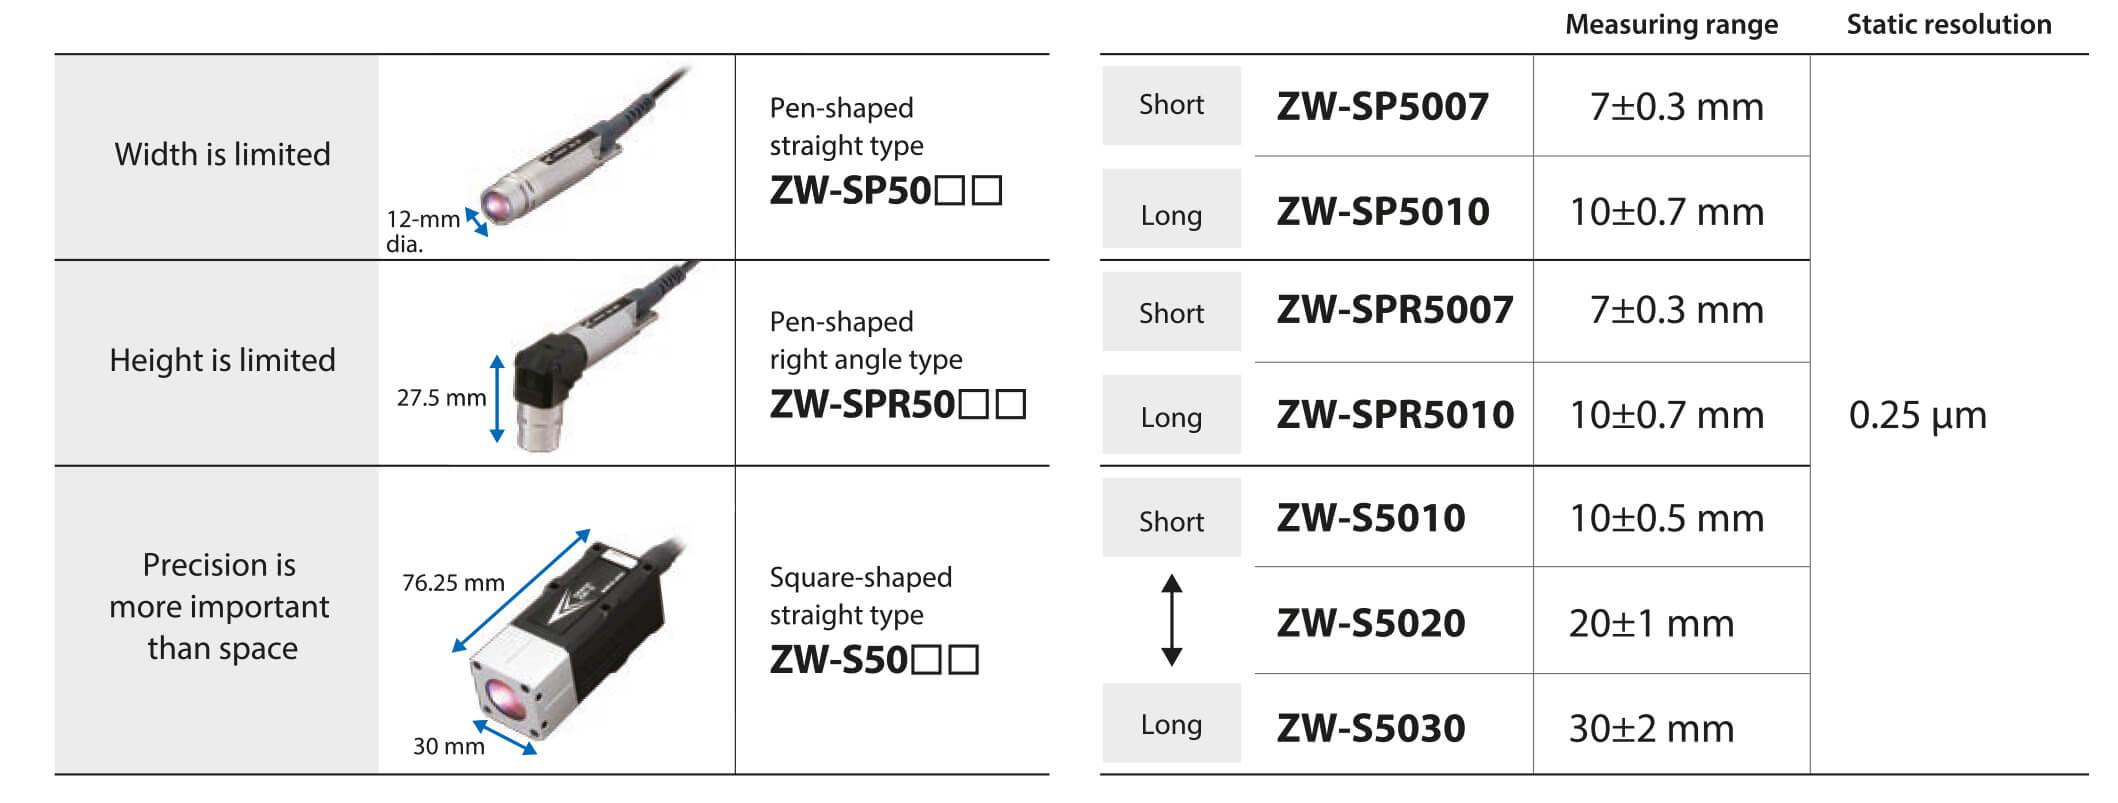 sensor controller zw-5000t table en prod